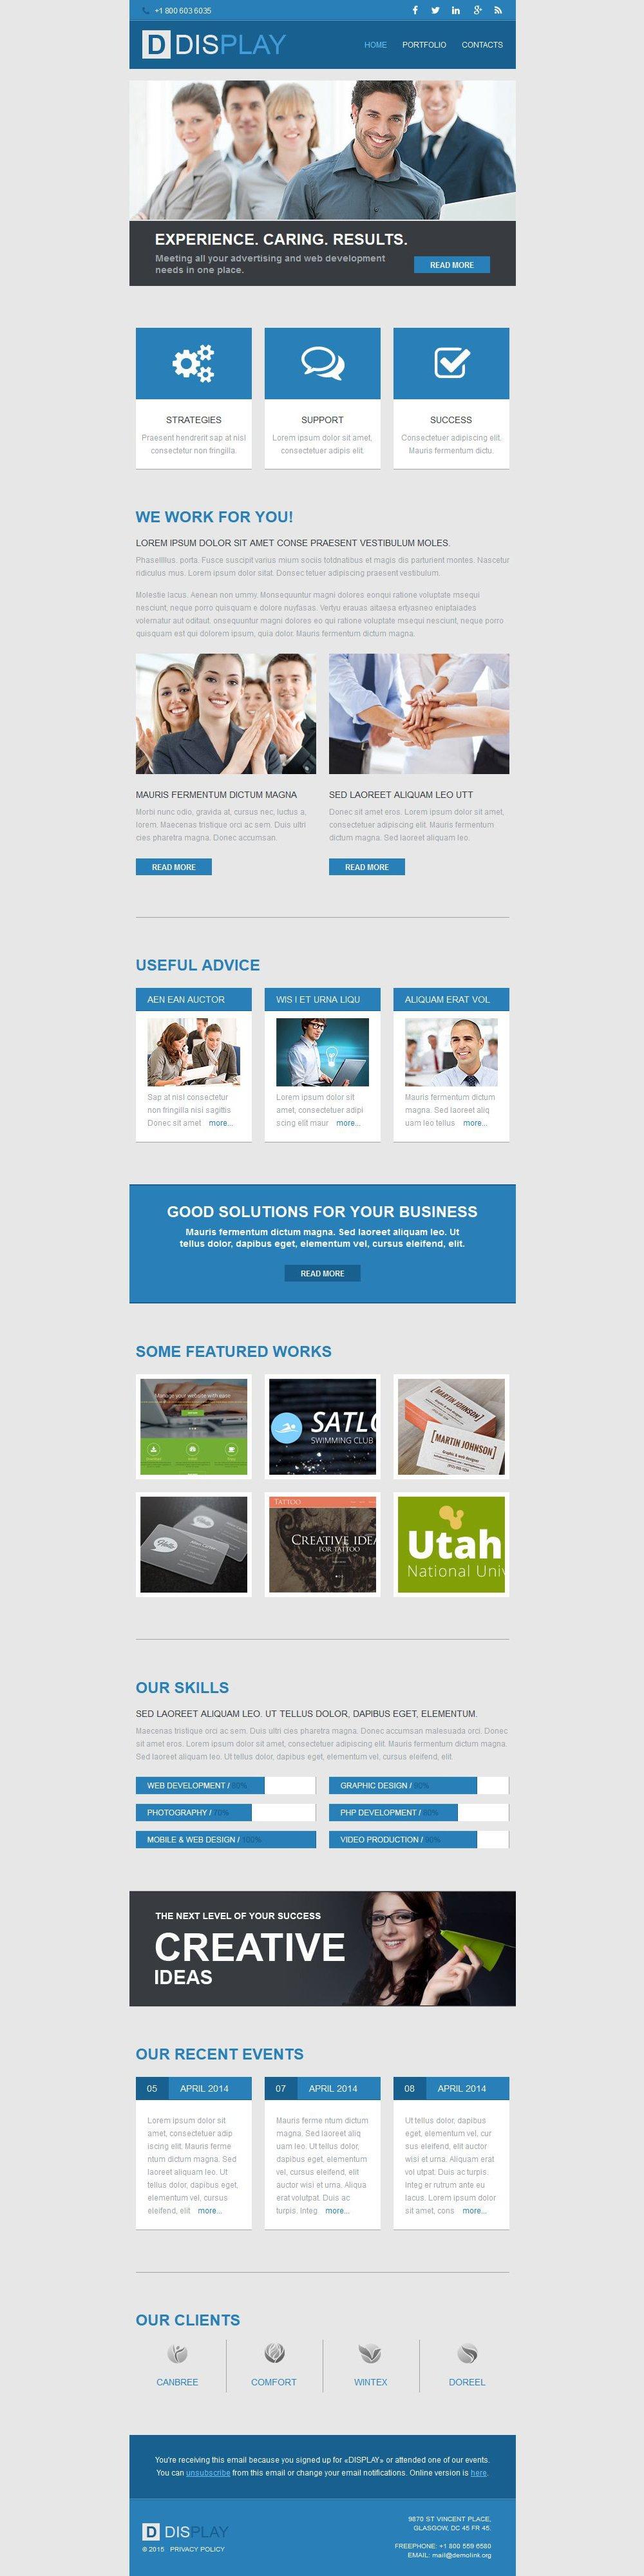 Reszponzív Web design Hírlevél sablon 52682